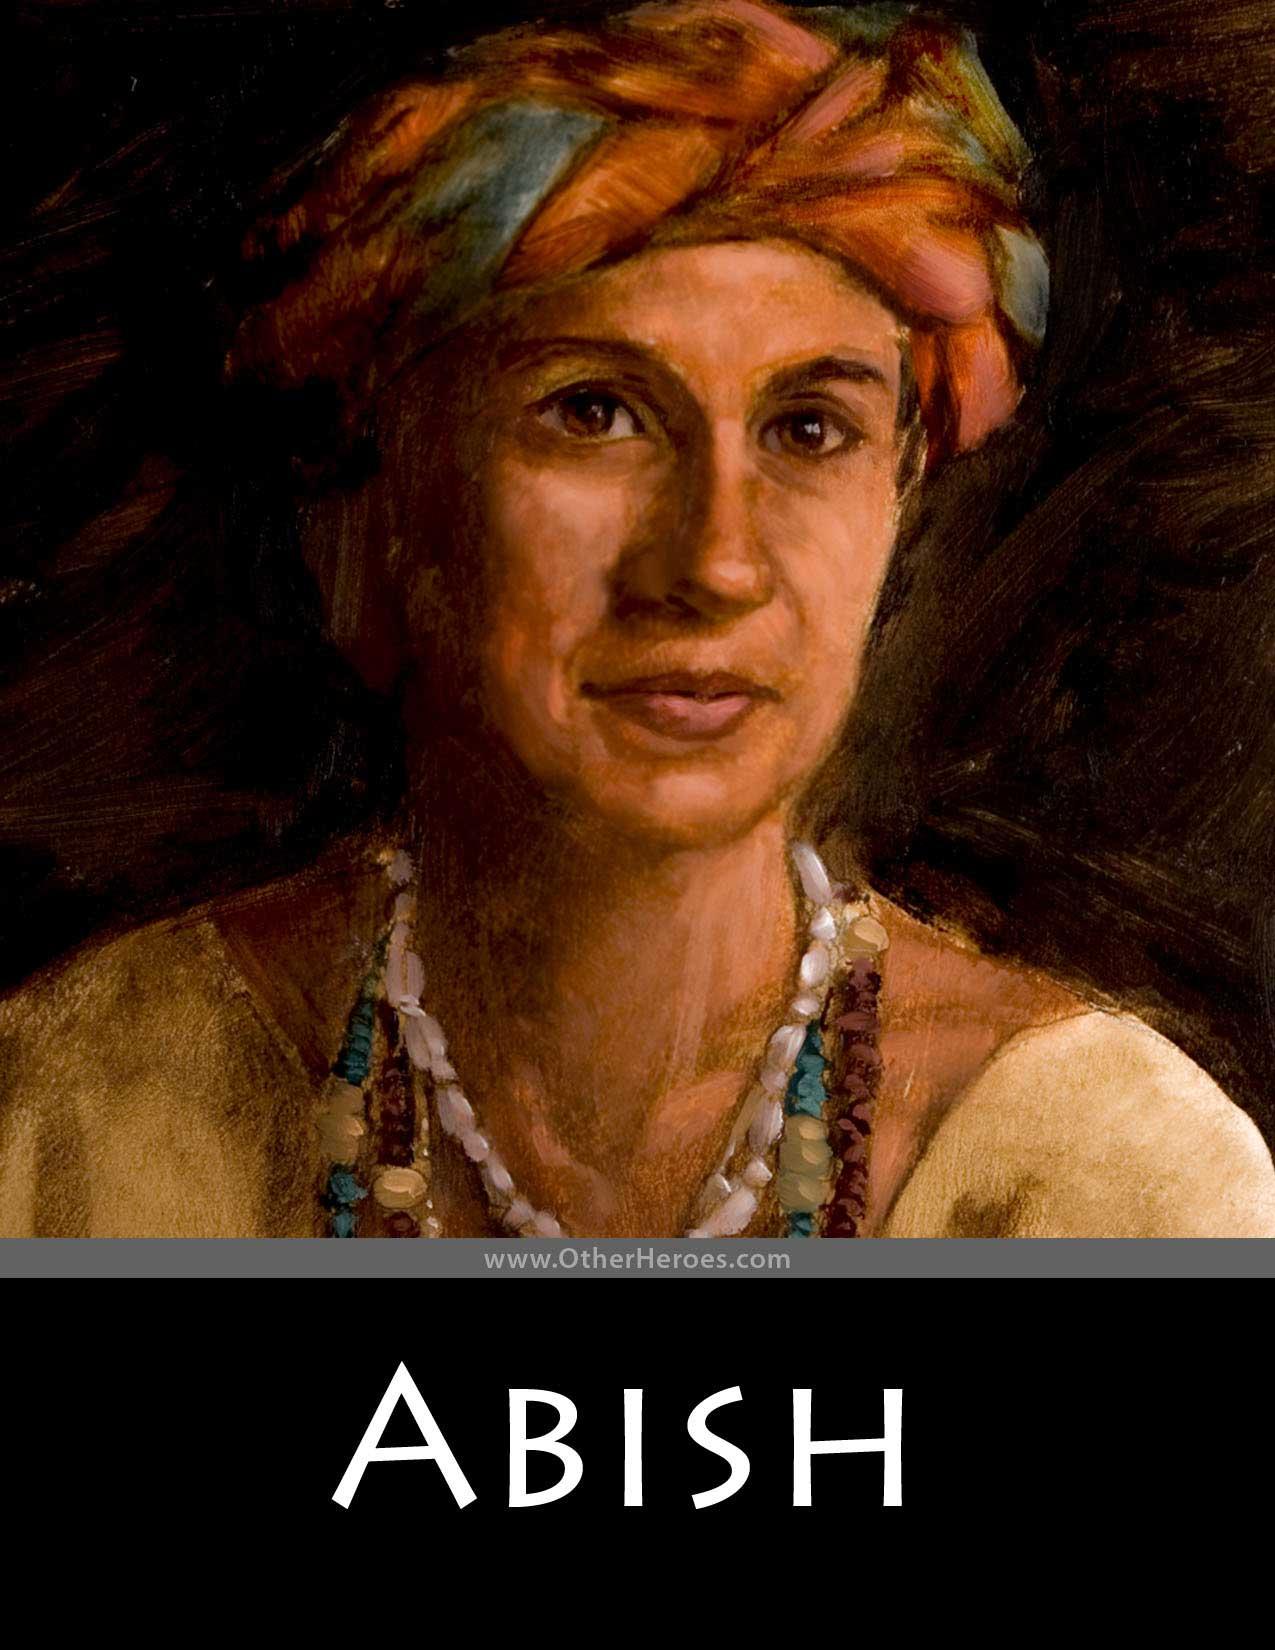 abish-james-fullmer